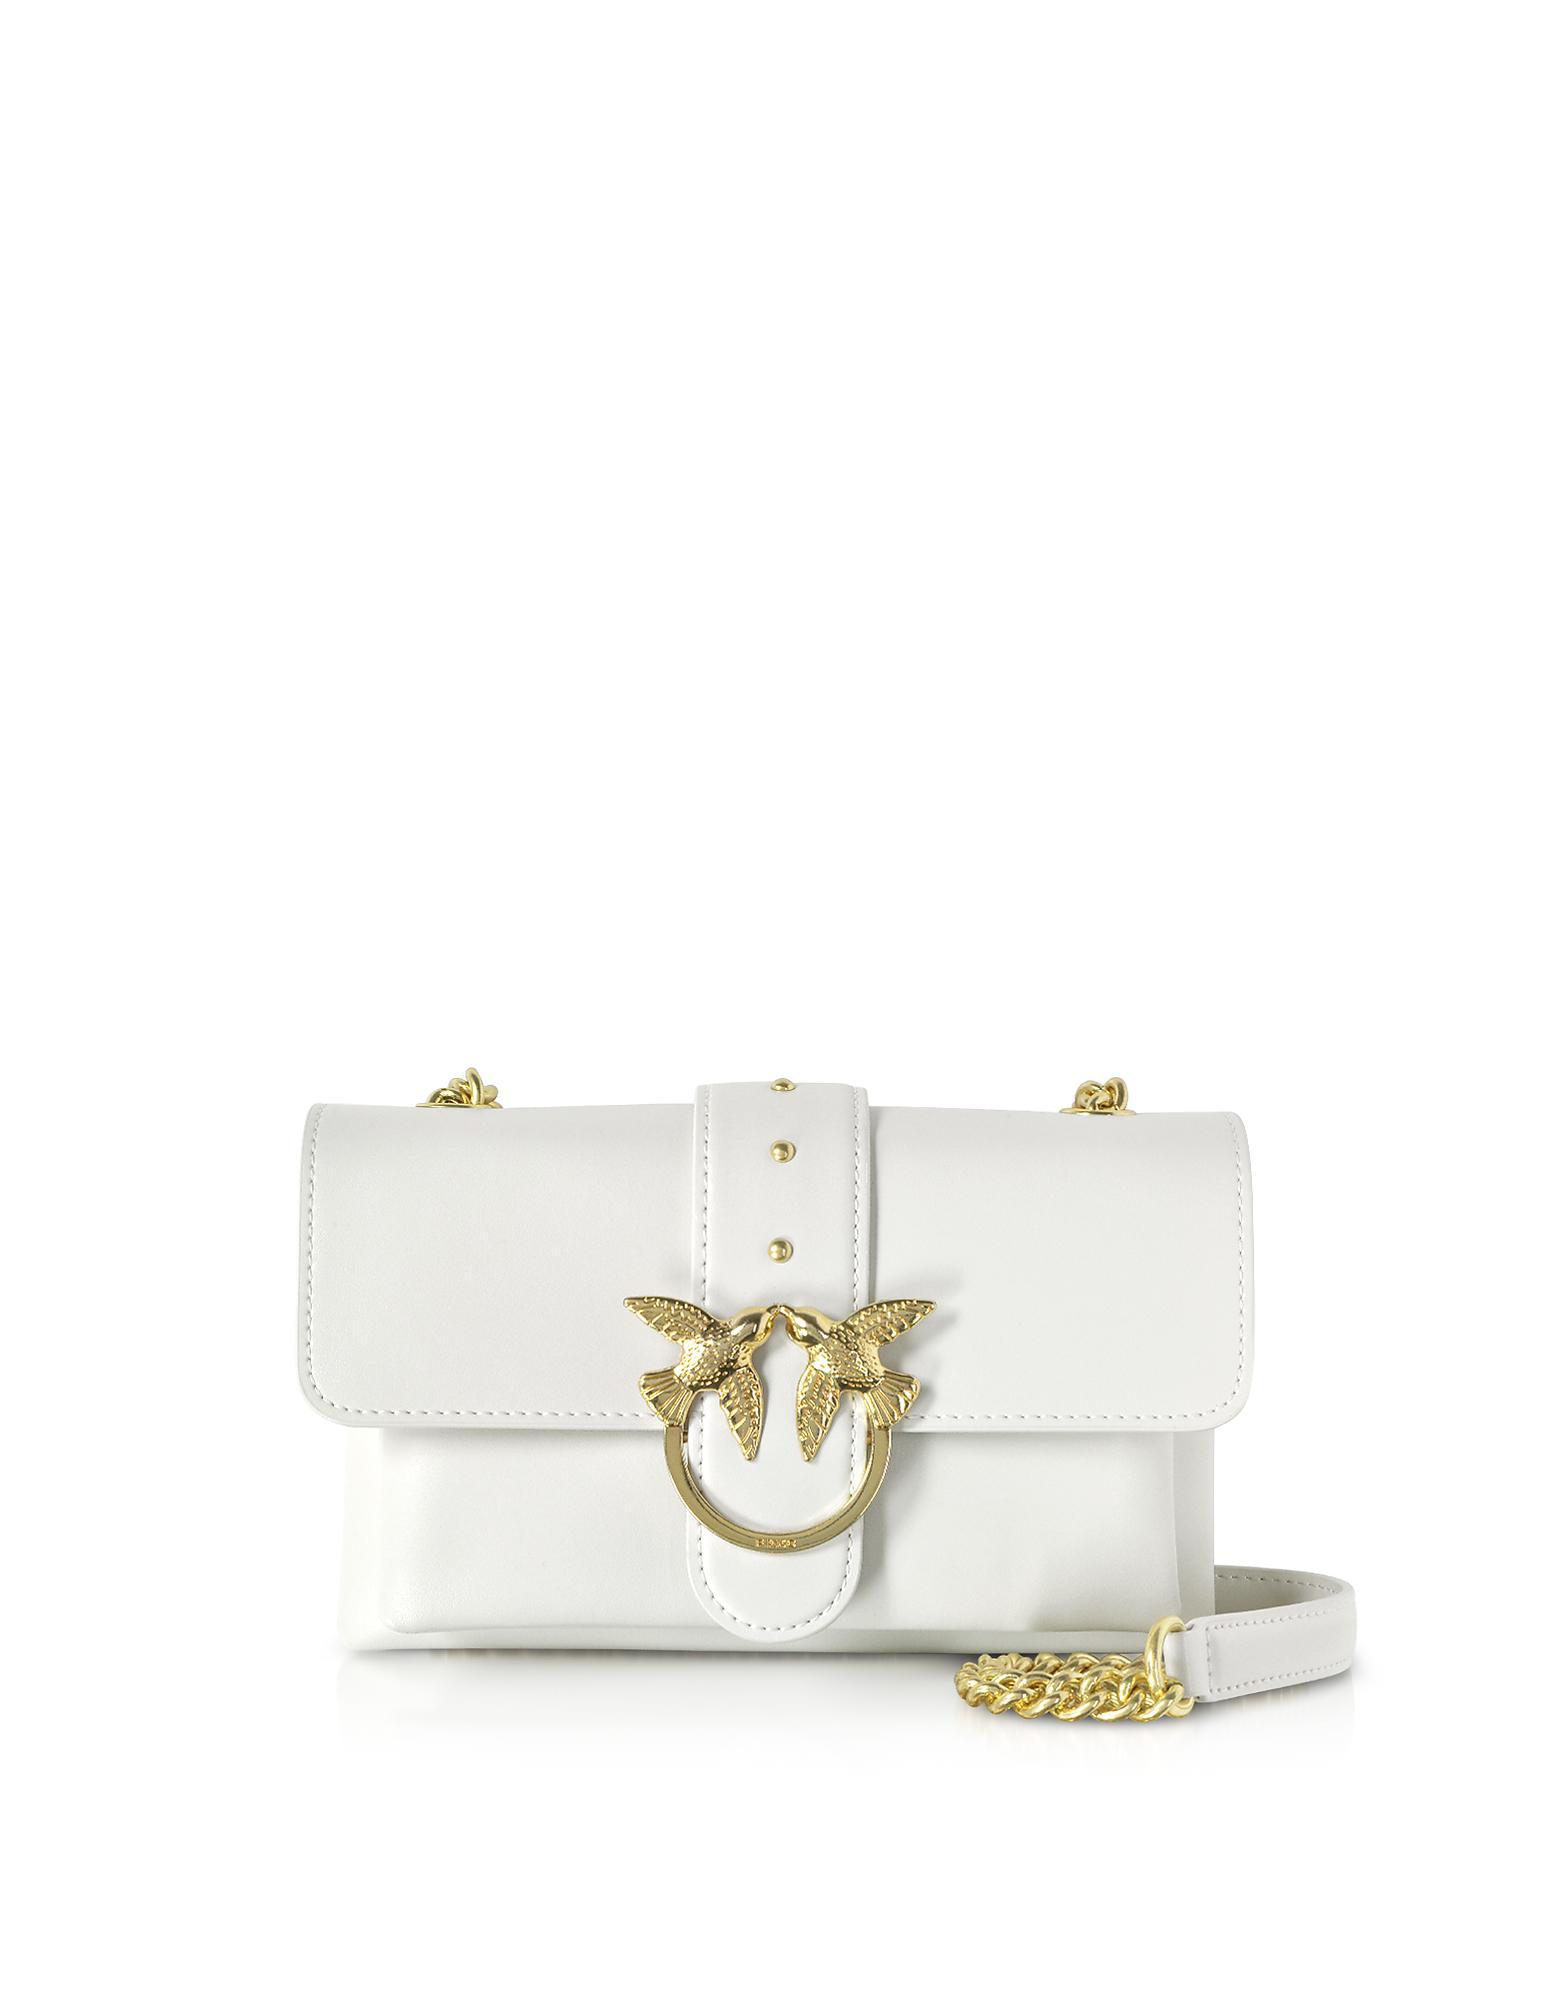 5257482c3005 Lyst - Pinko Mini Love Soft Shoulder Bag in White